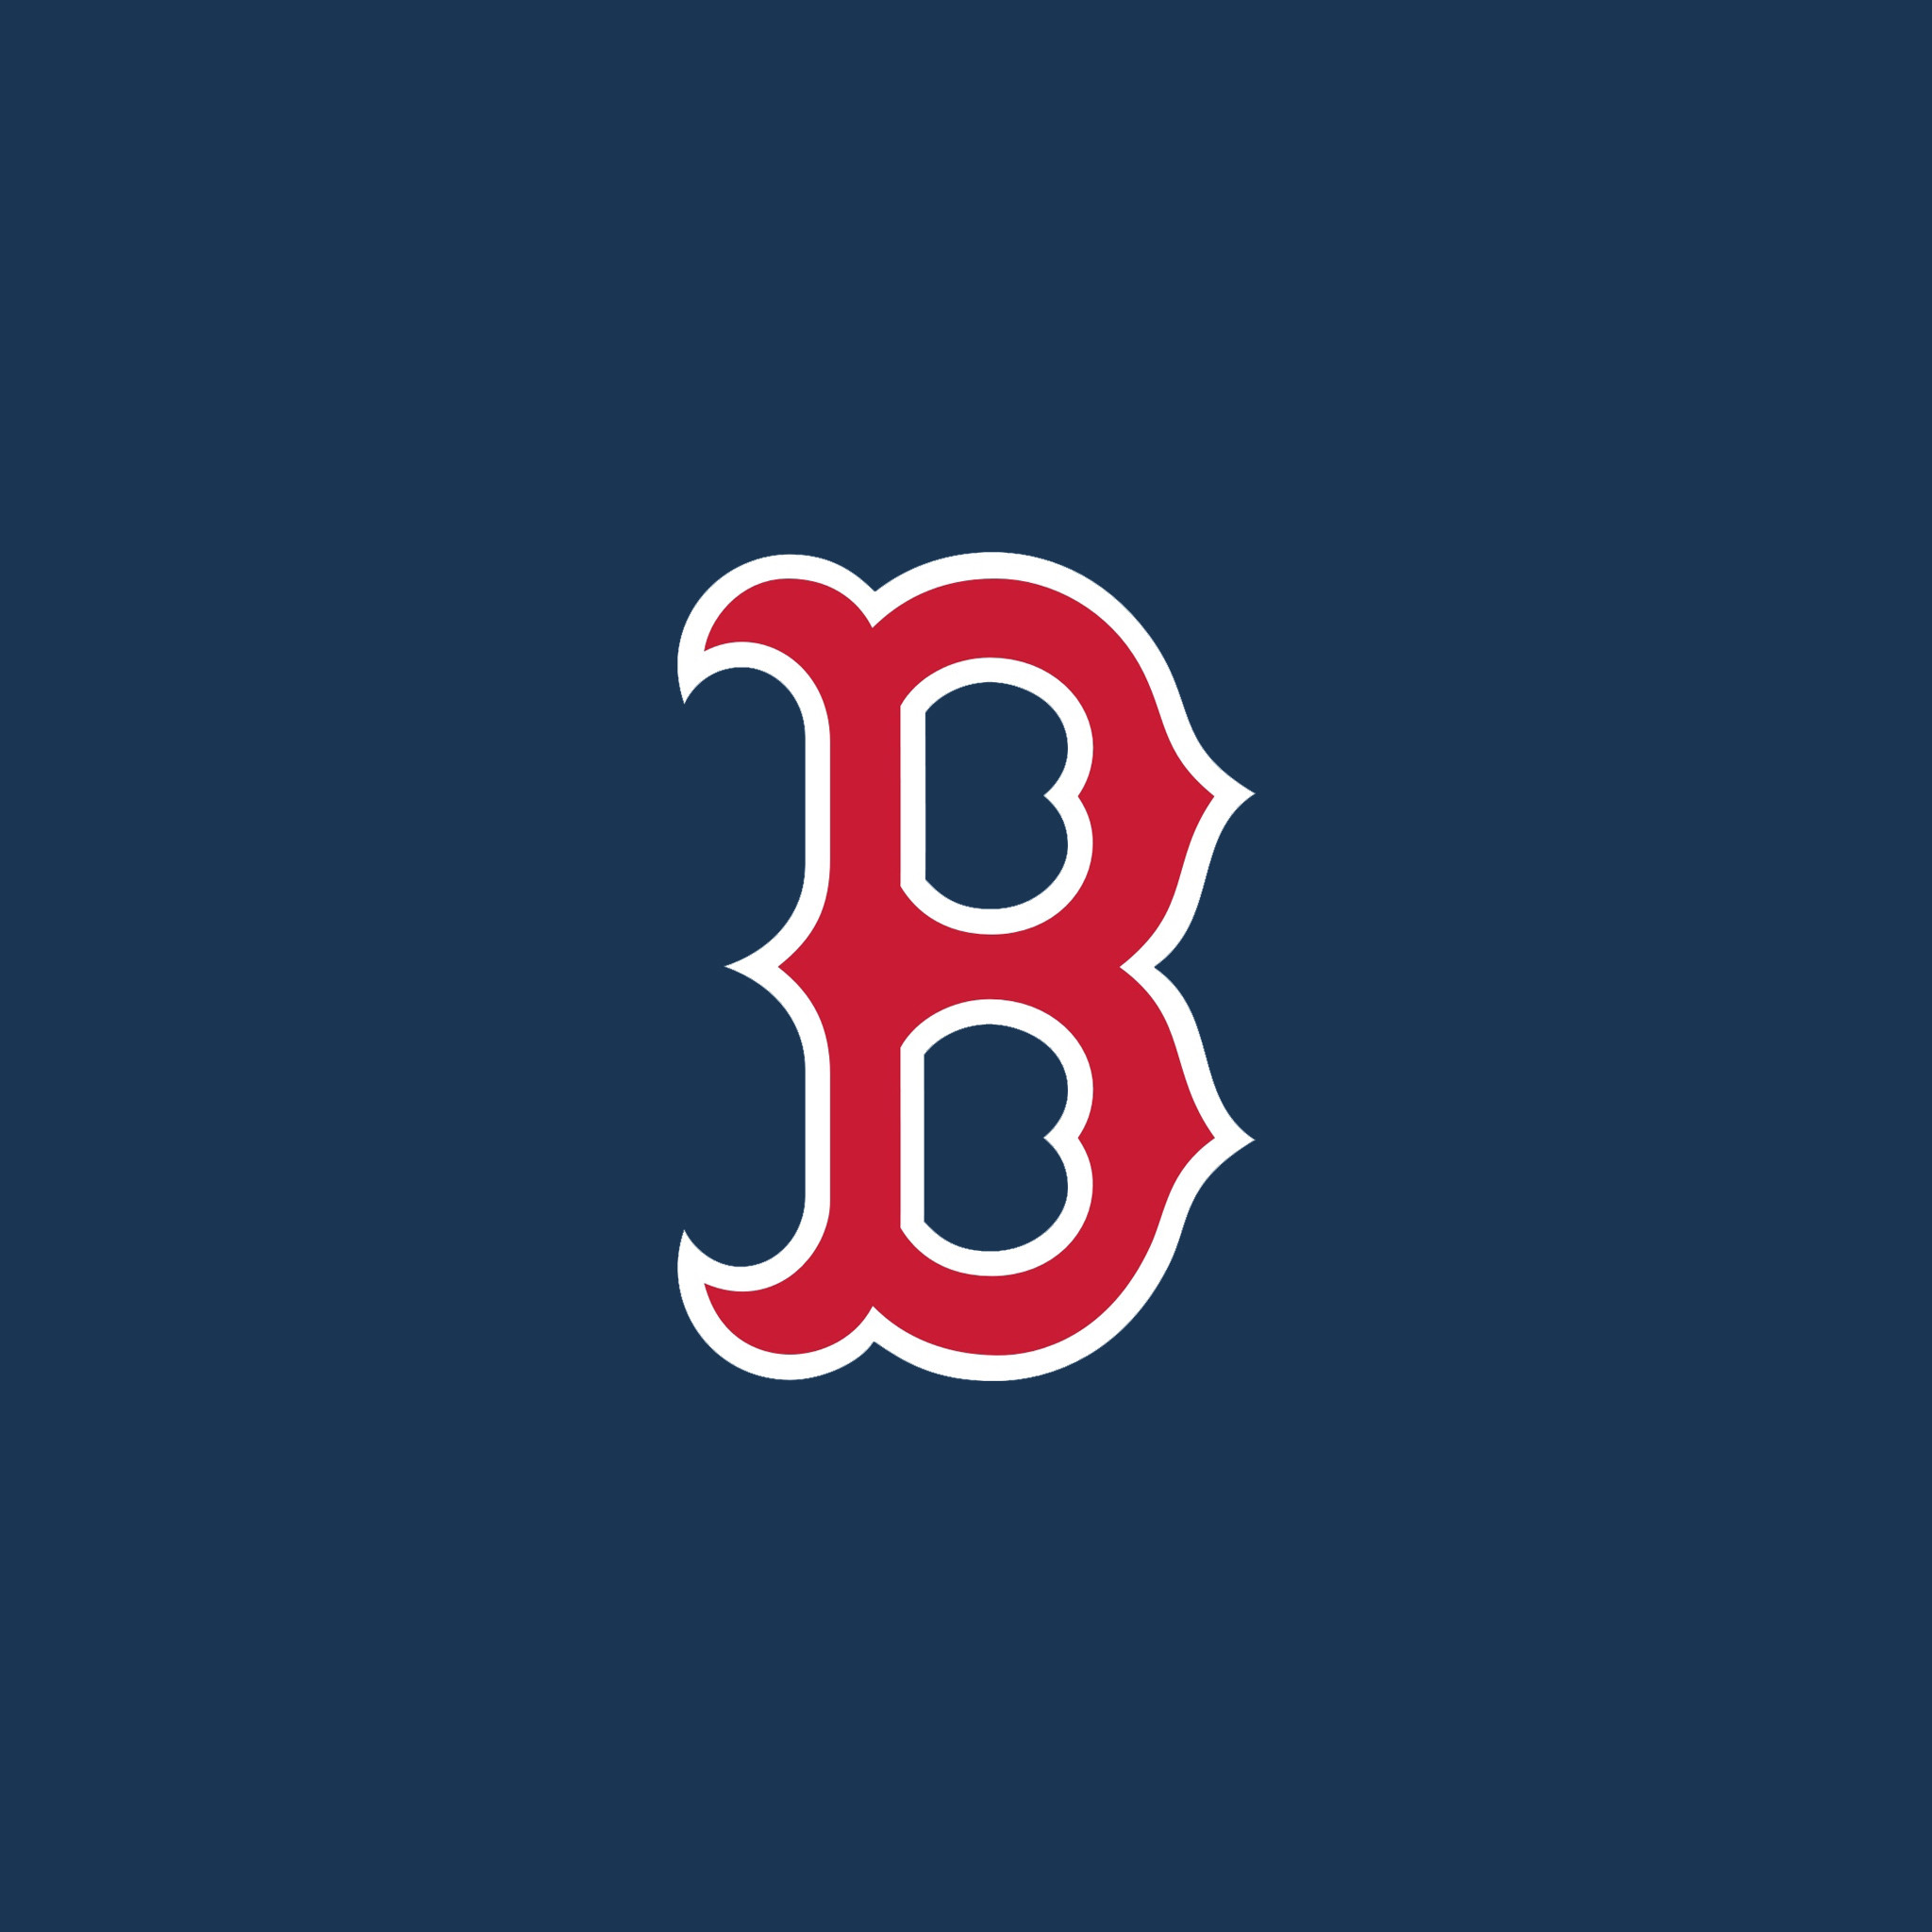 Free Boston Red Sox desktop wallpaper | Boston Red Sox wallpapers